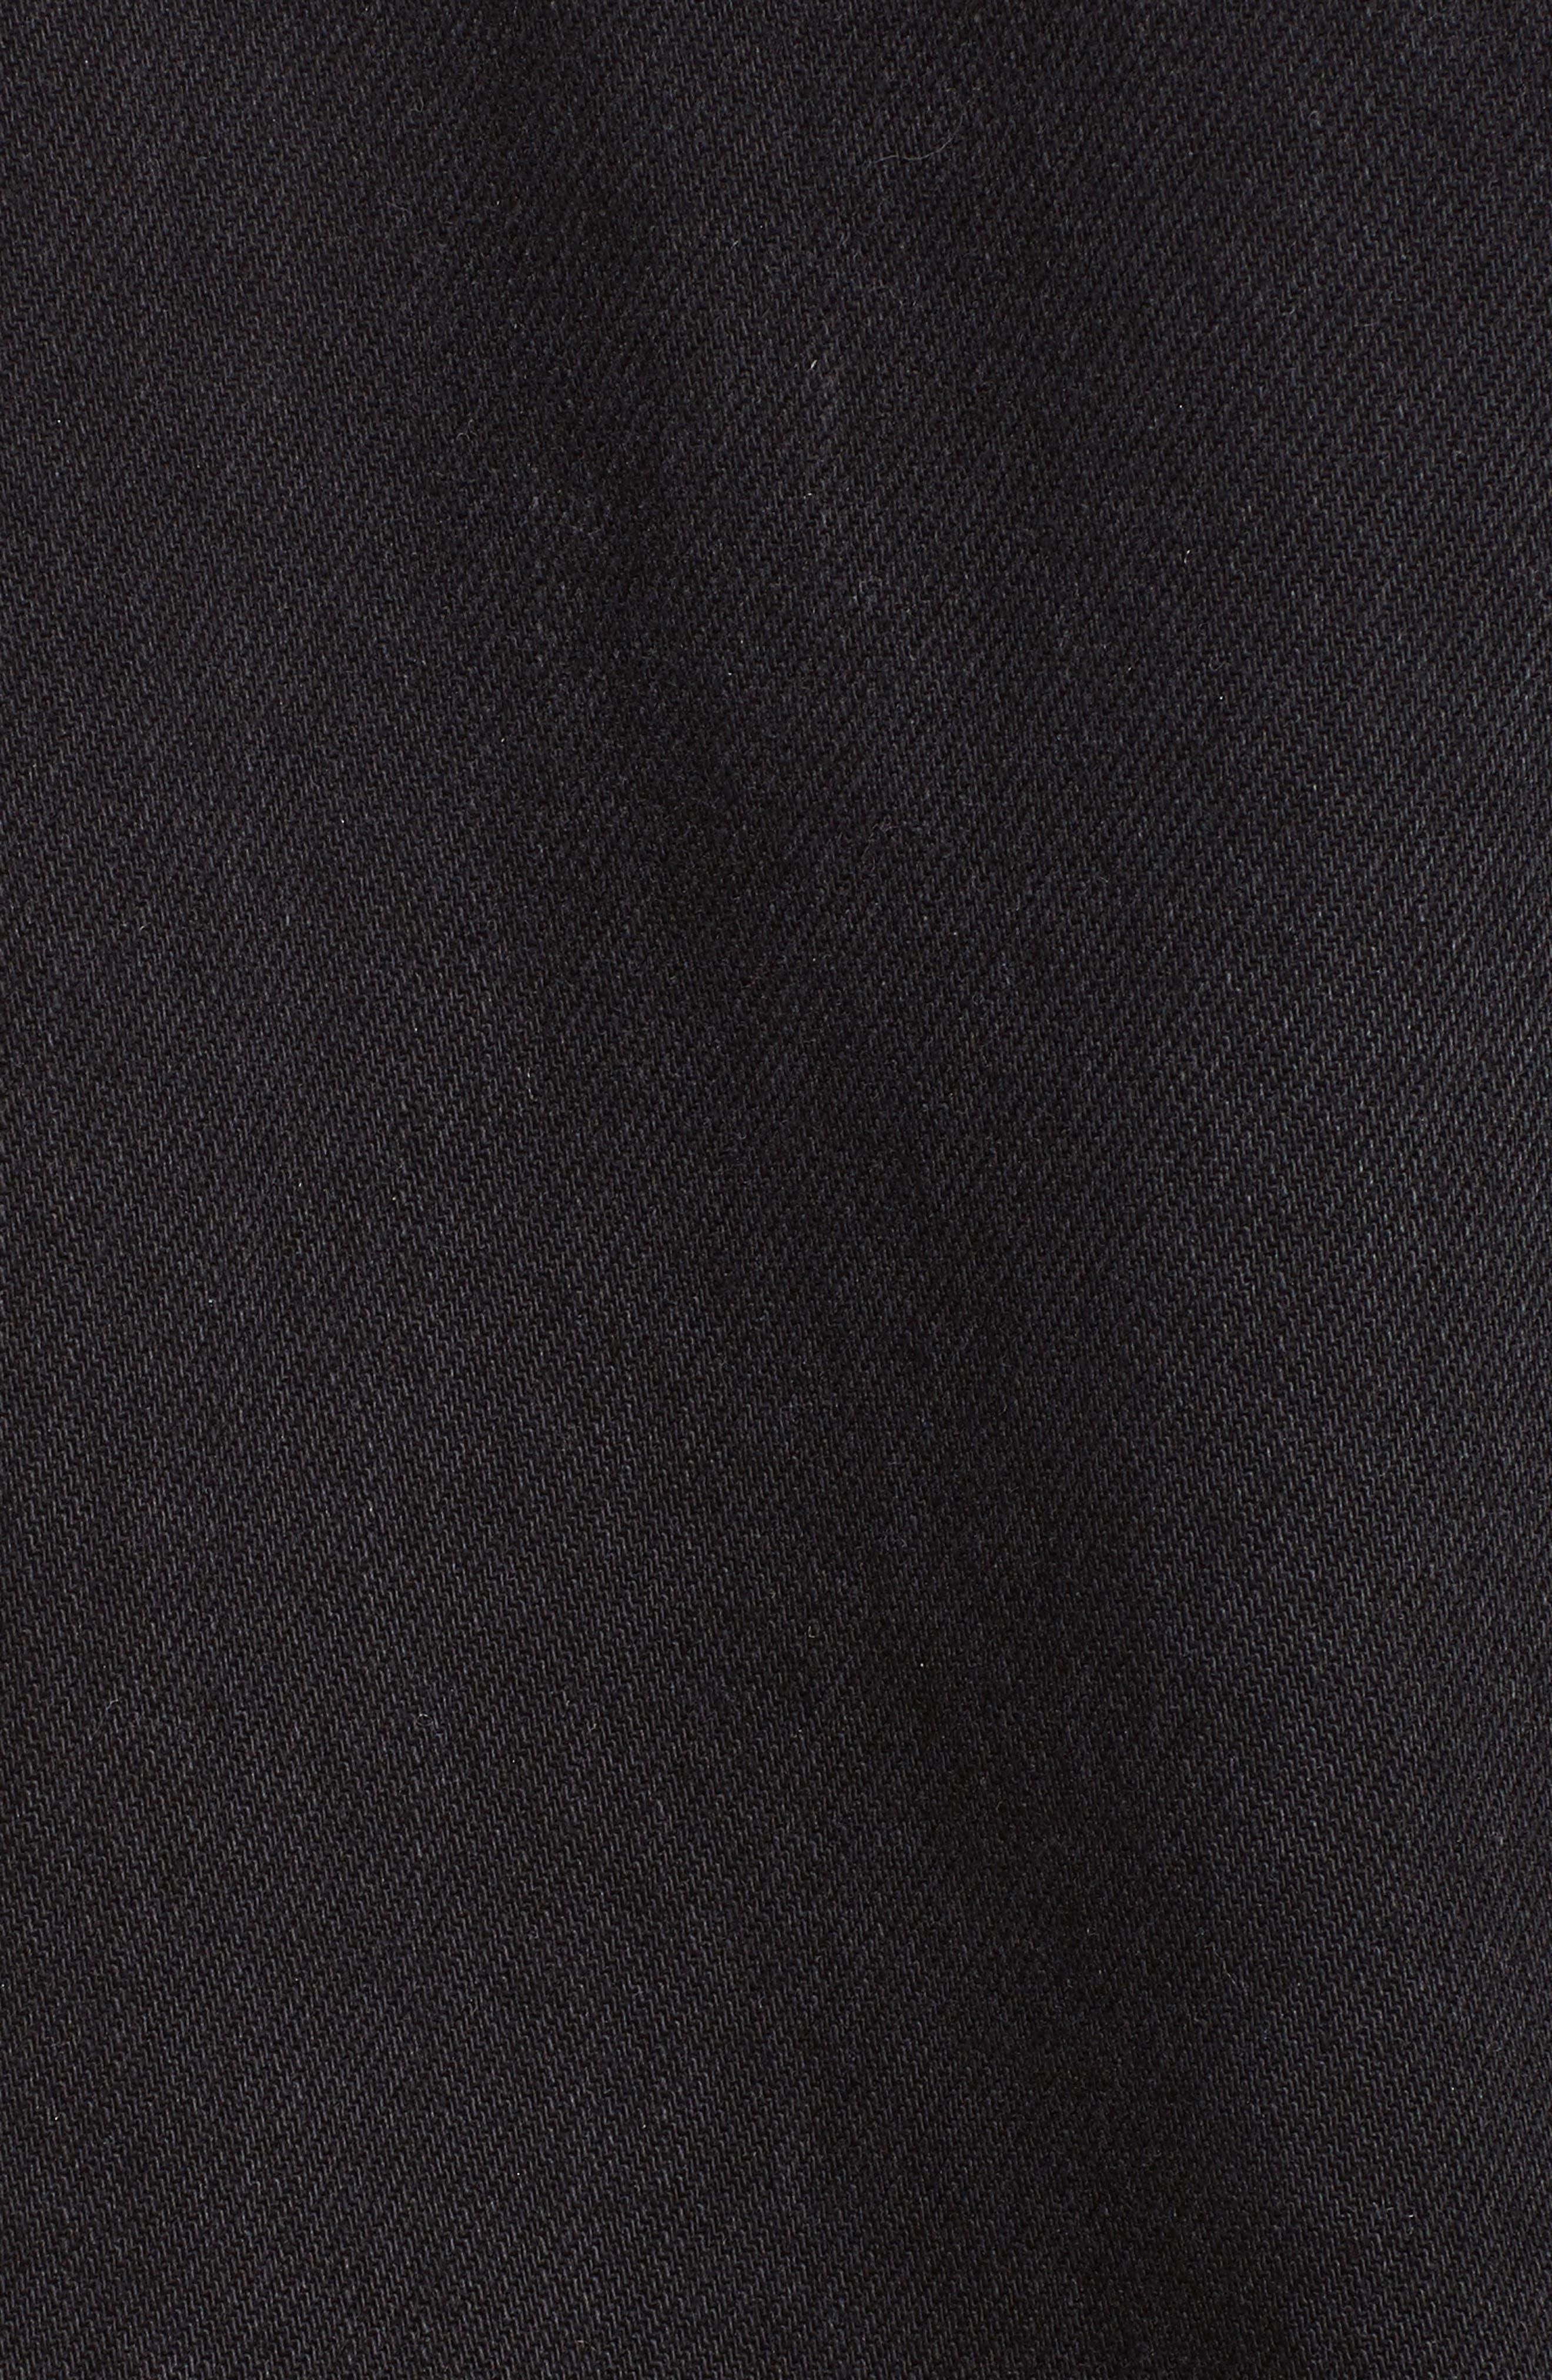 Le Cuffed Denim Jacket,                             Alternate thumbnail 5, color,                             001